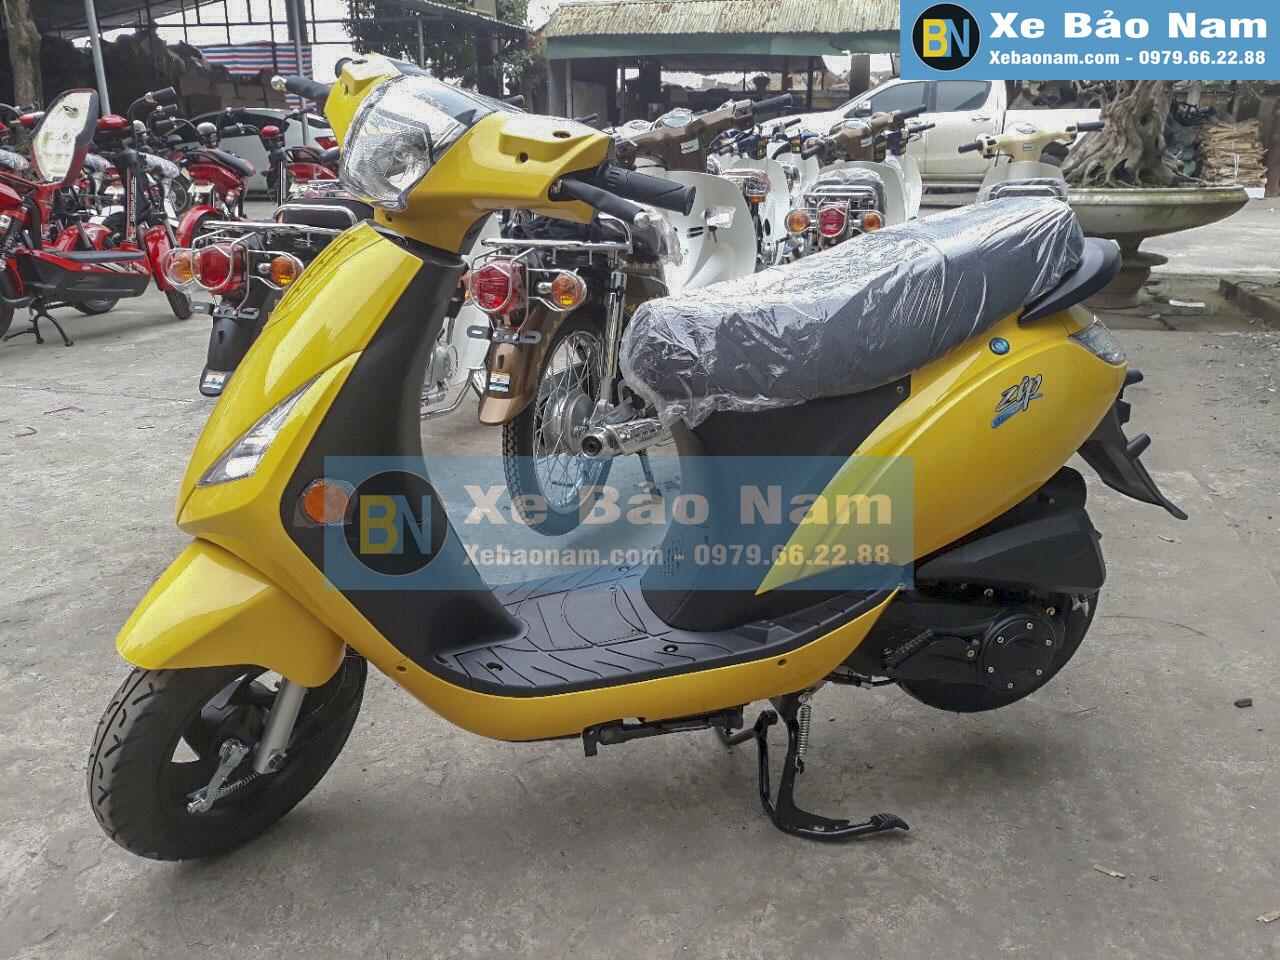   xe-may-zip-50cc-xebaonam-11